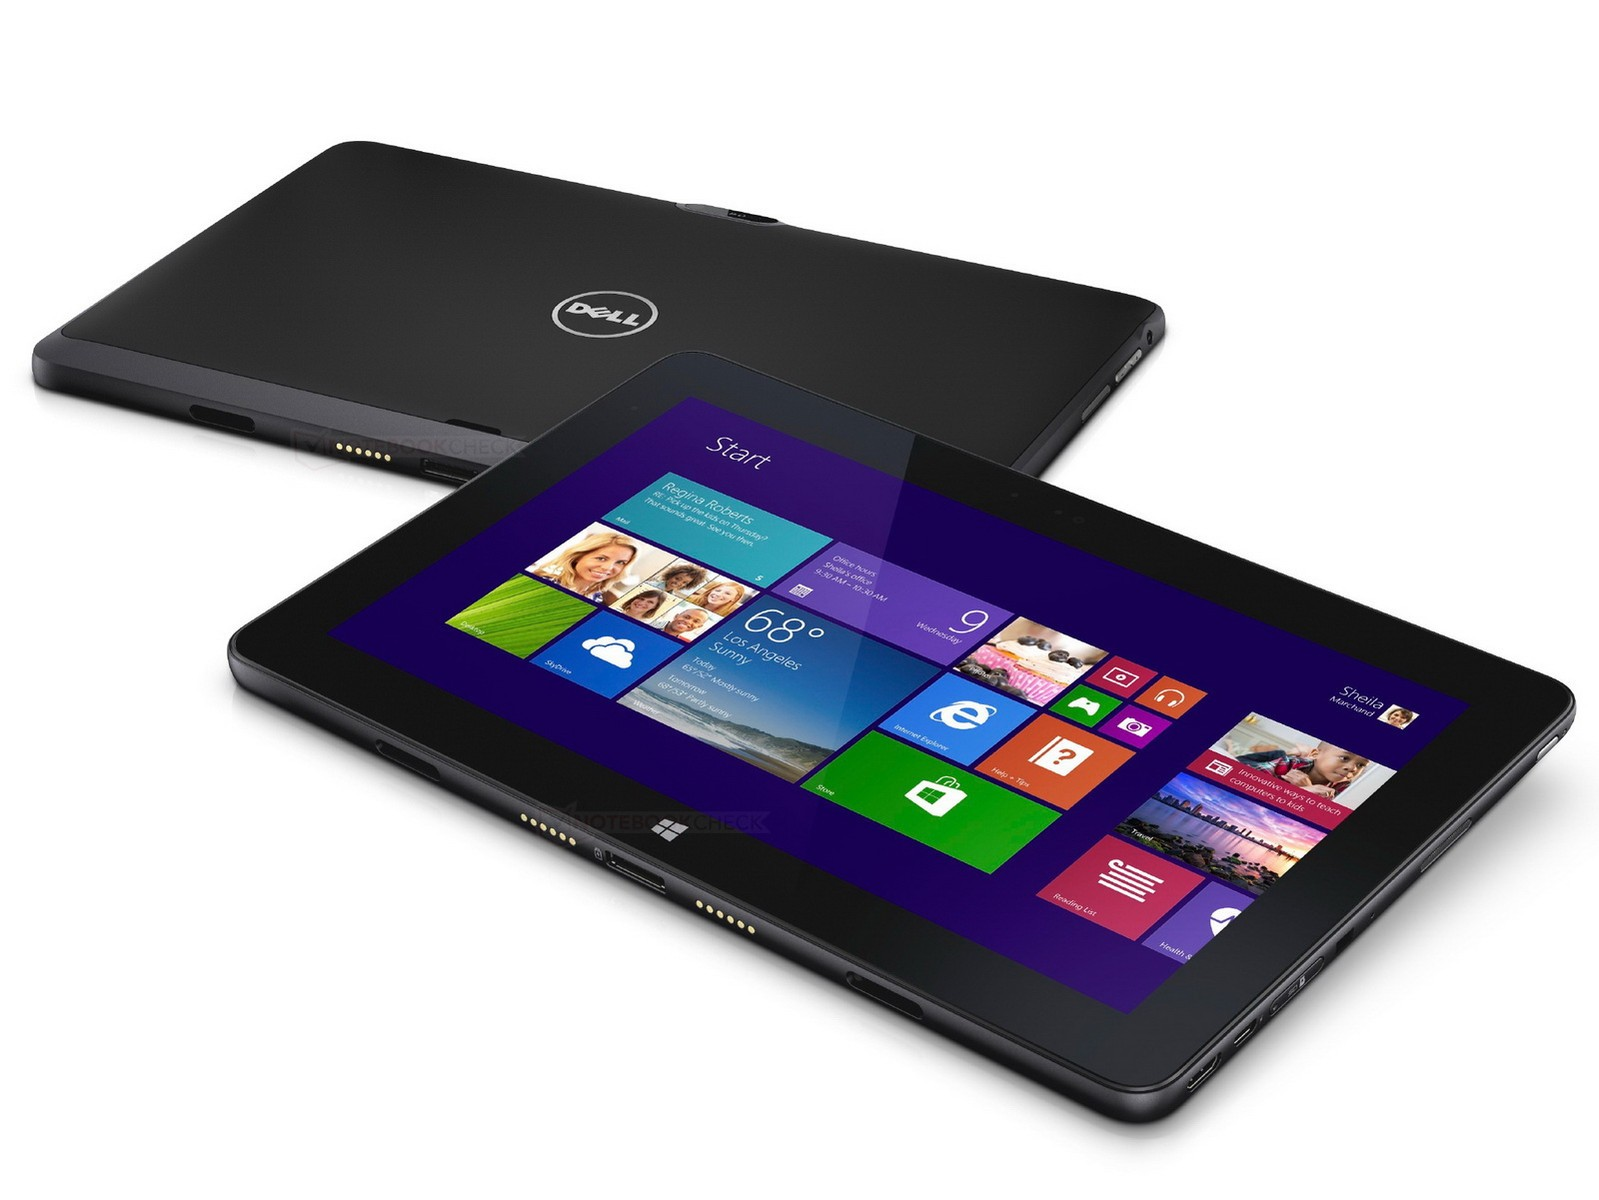 DELL-VNU11-T07G-I5-256GB-Refurbished Dell Venue 11 Pro T07G Tablet Wi-Fi 10.8-inch 8 GB RAM 256 GB HDD Core i5 Windows 10 Pro-image